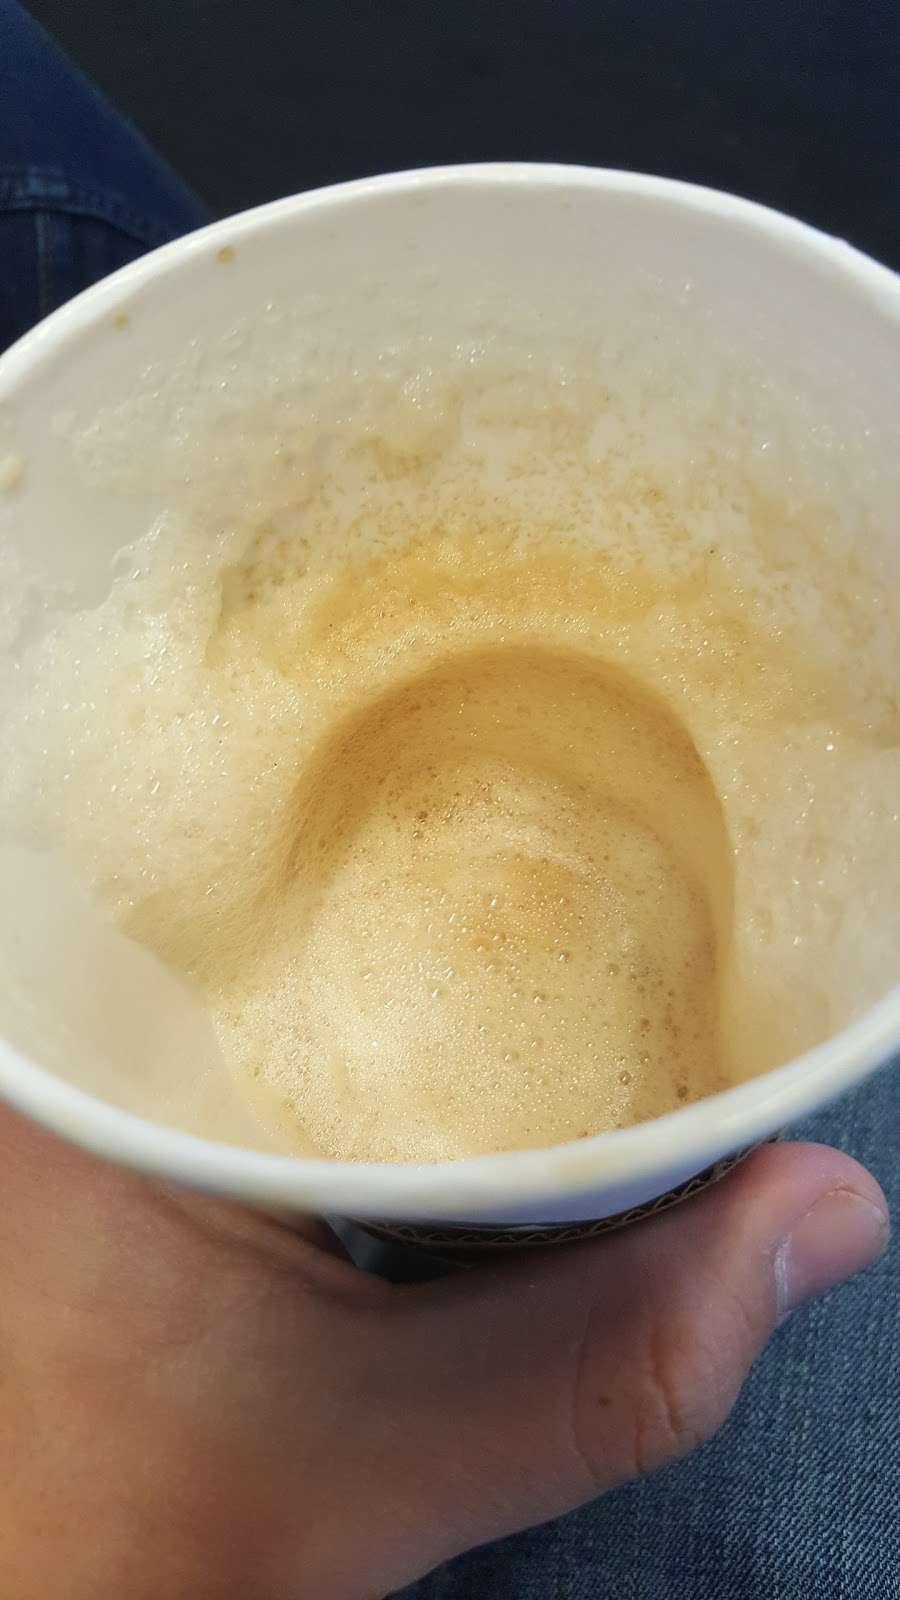 Starbucks - cafe  | Photo 9 of 10 | Address: 201 World Way, Los Angeles, CA 90045, USA | Phone: (310) 646-3472